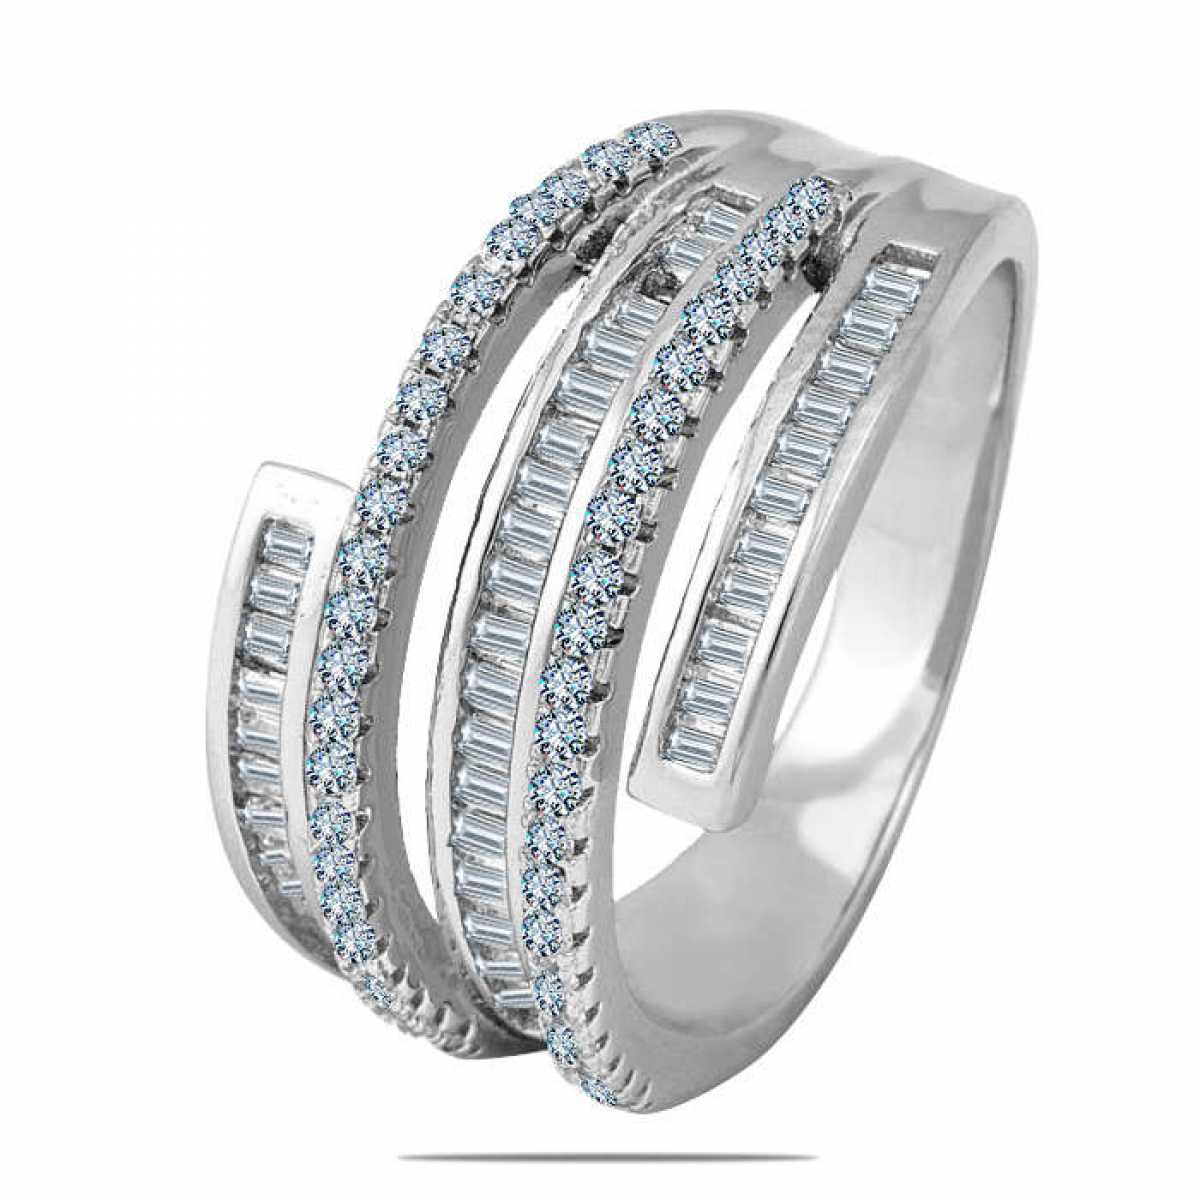 Spiral binding sterling silver ring